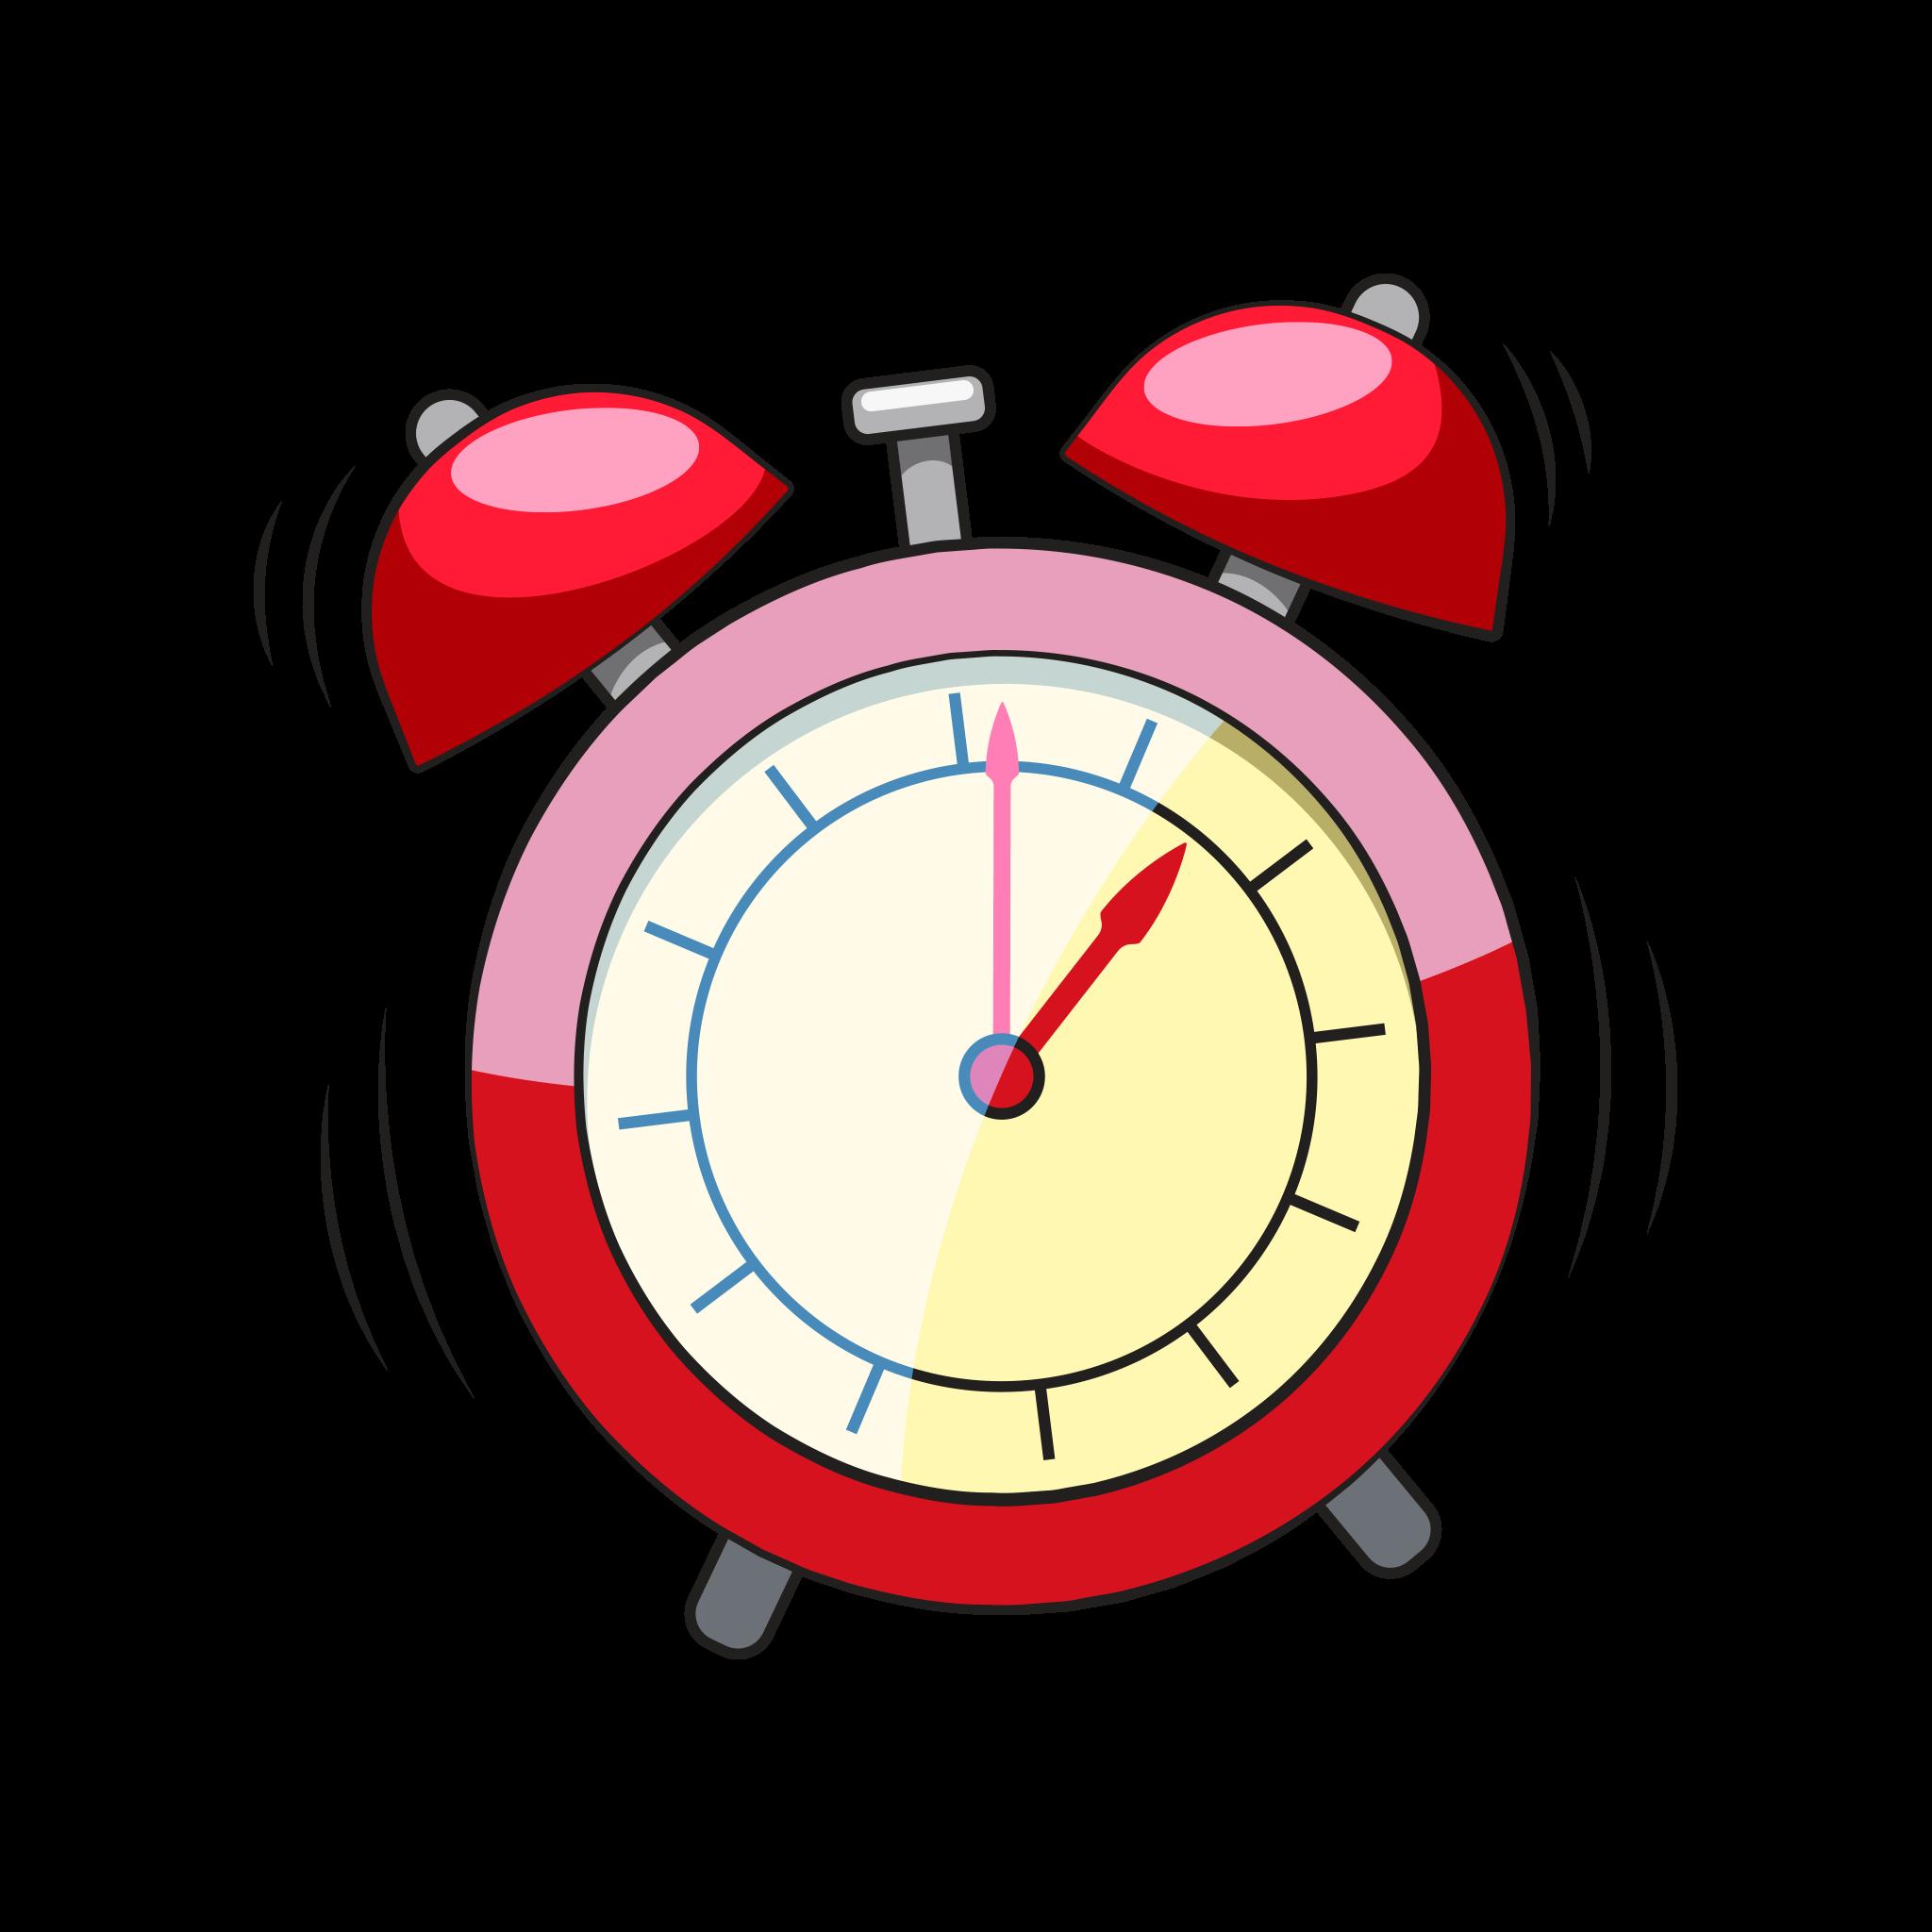 Alarm Clock Clipart PNG Image Free Download searchpng.com.